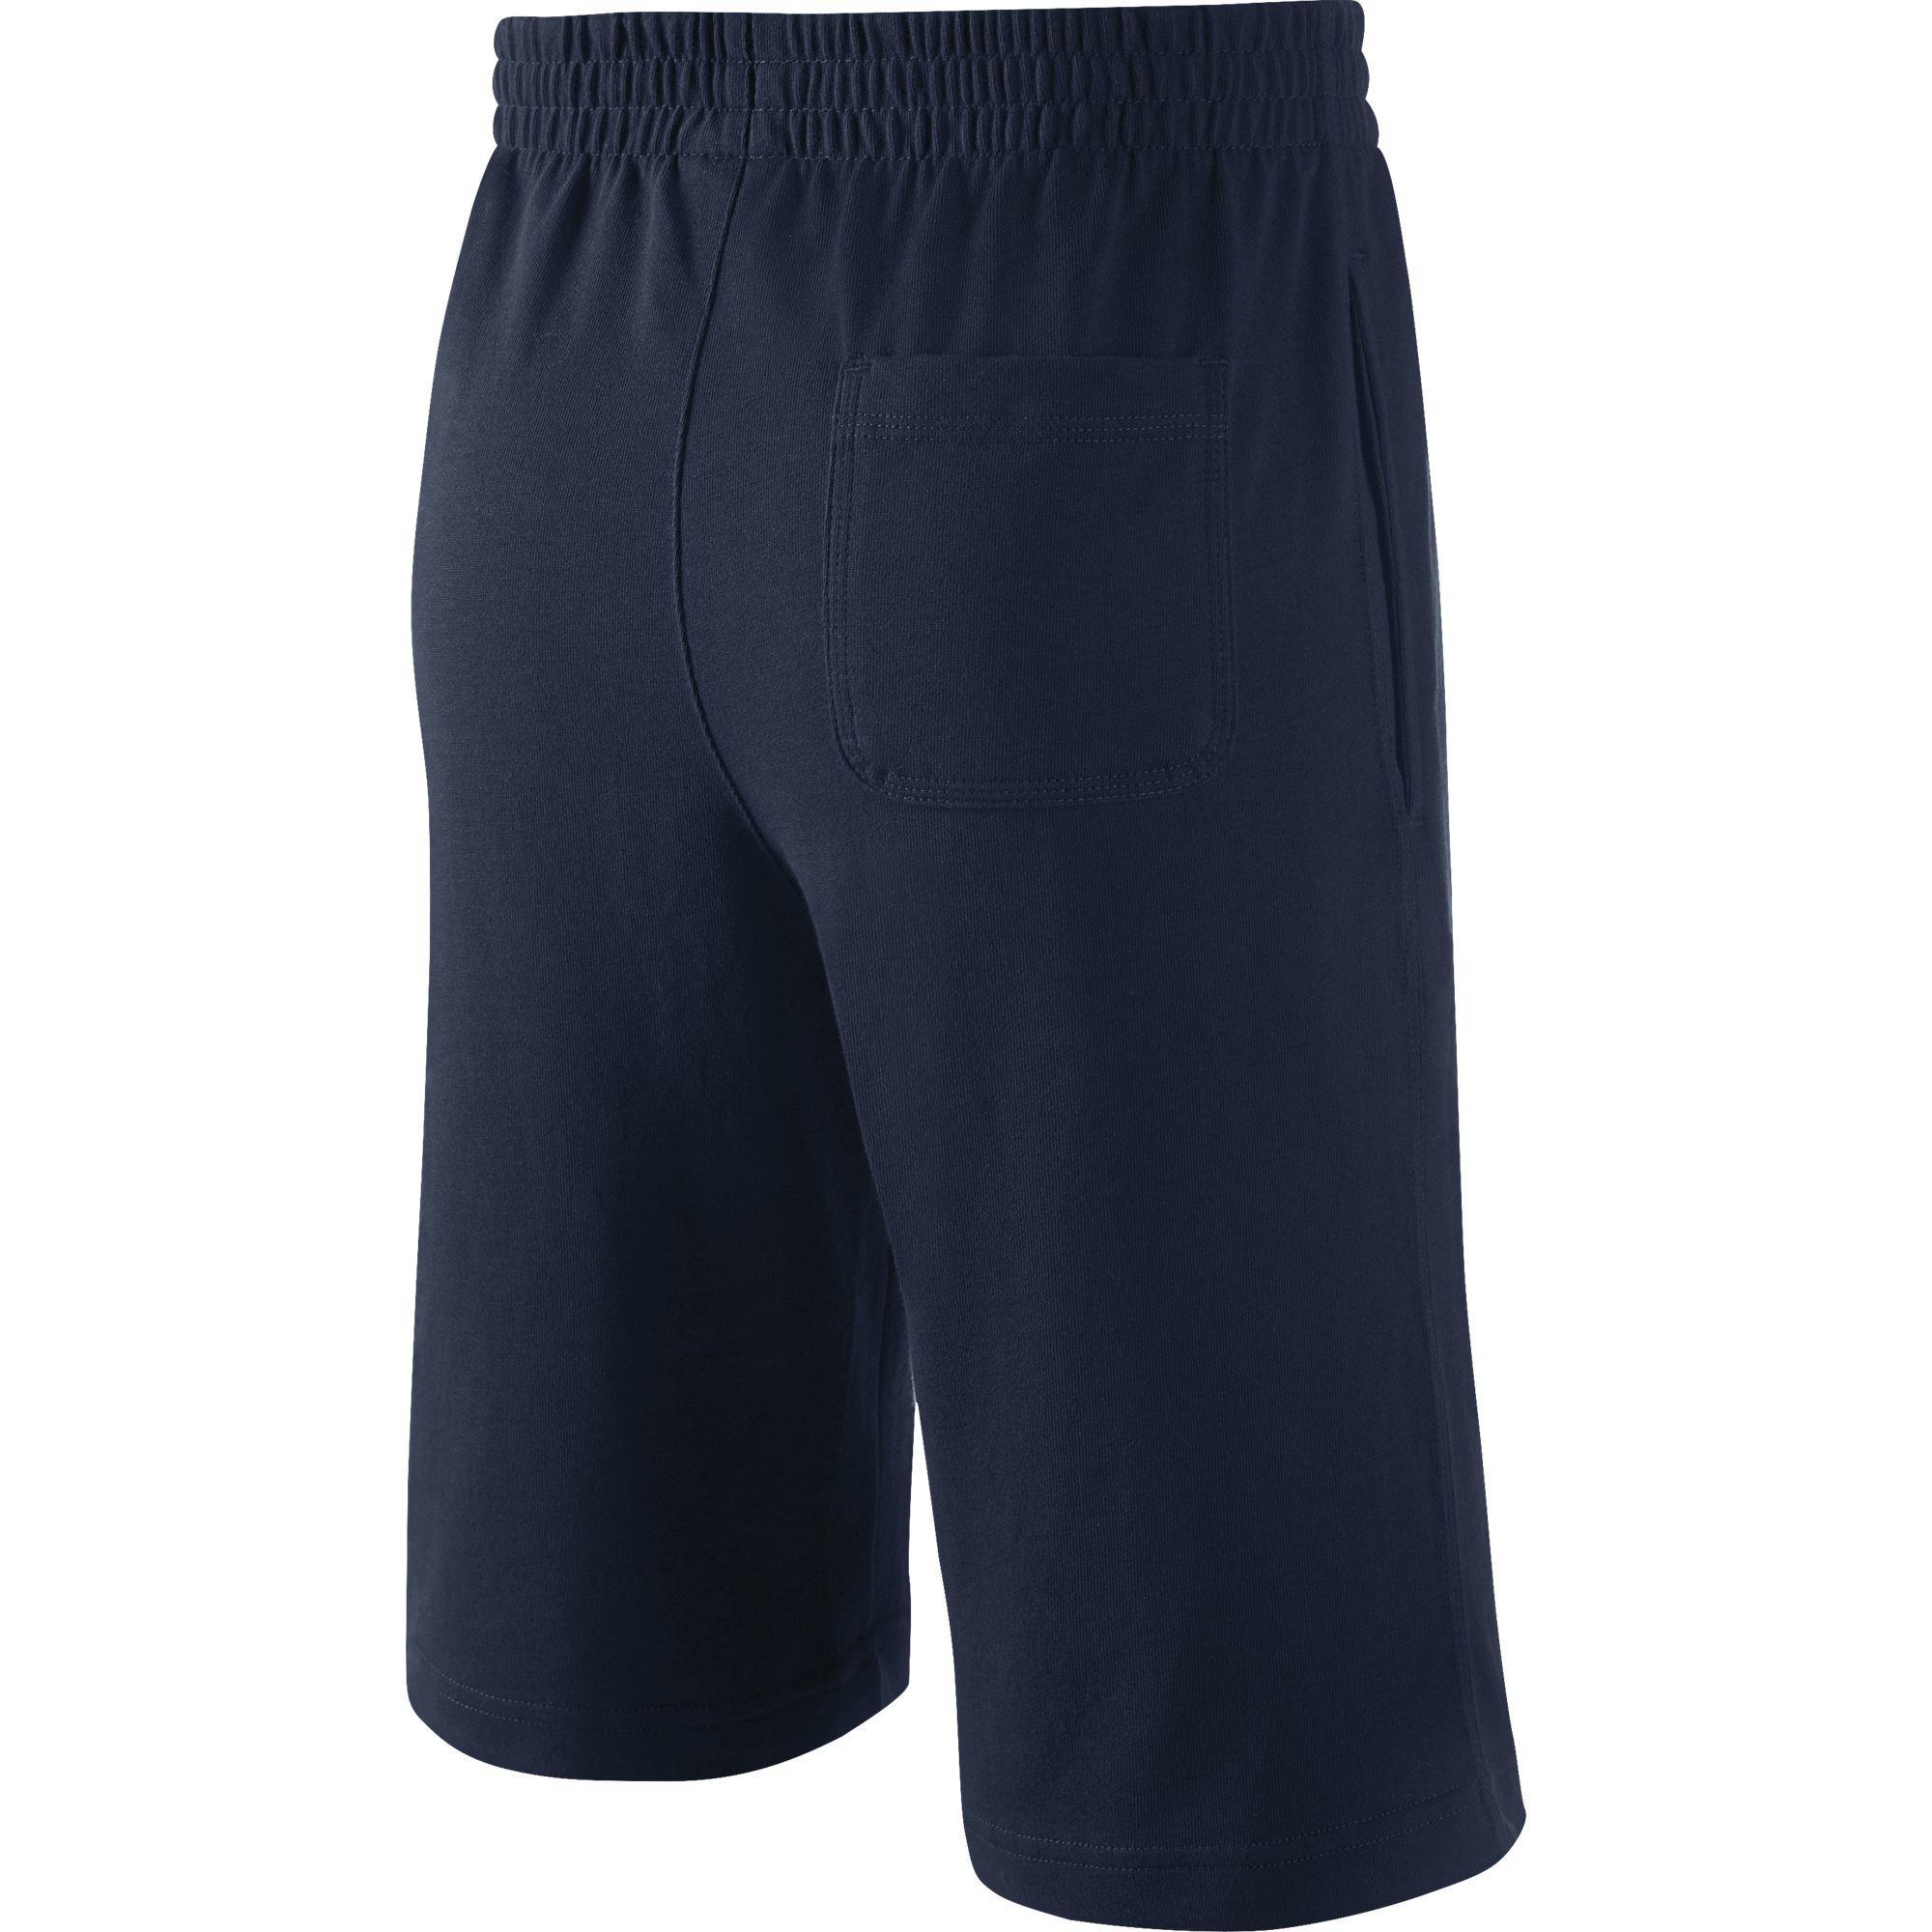 69ba0062b6 Nike Boys N45 Jersey Shorts - Blue - Tennisnuts.com